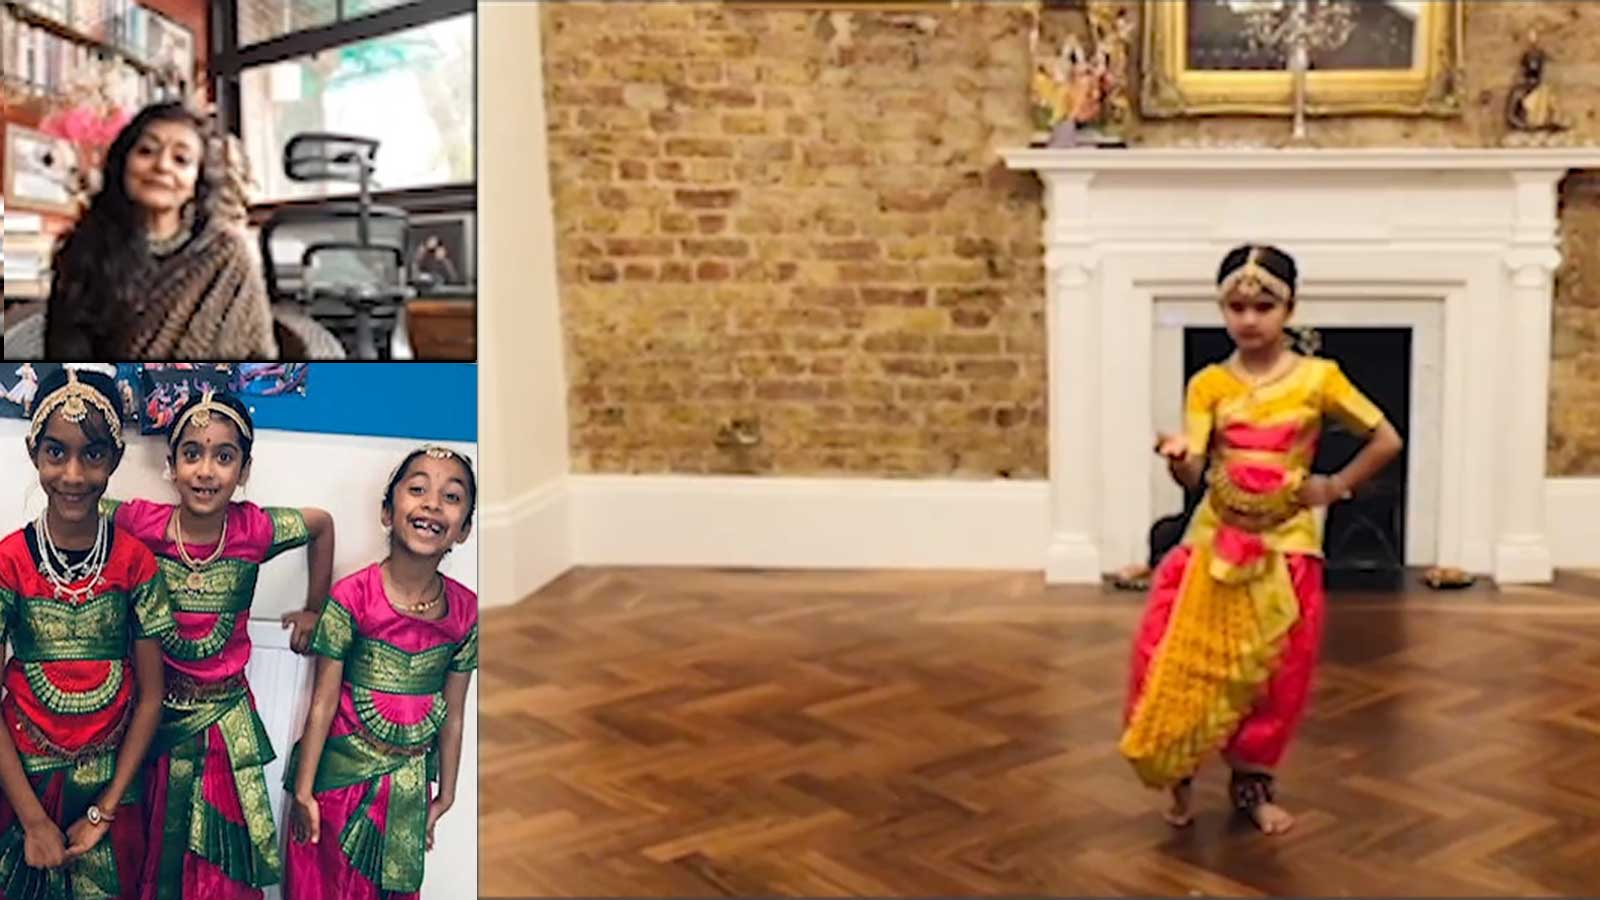 digital-cultural-project-brings-grandparents-in-india-closer-to-their-grandkids-in-uk